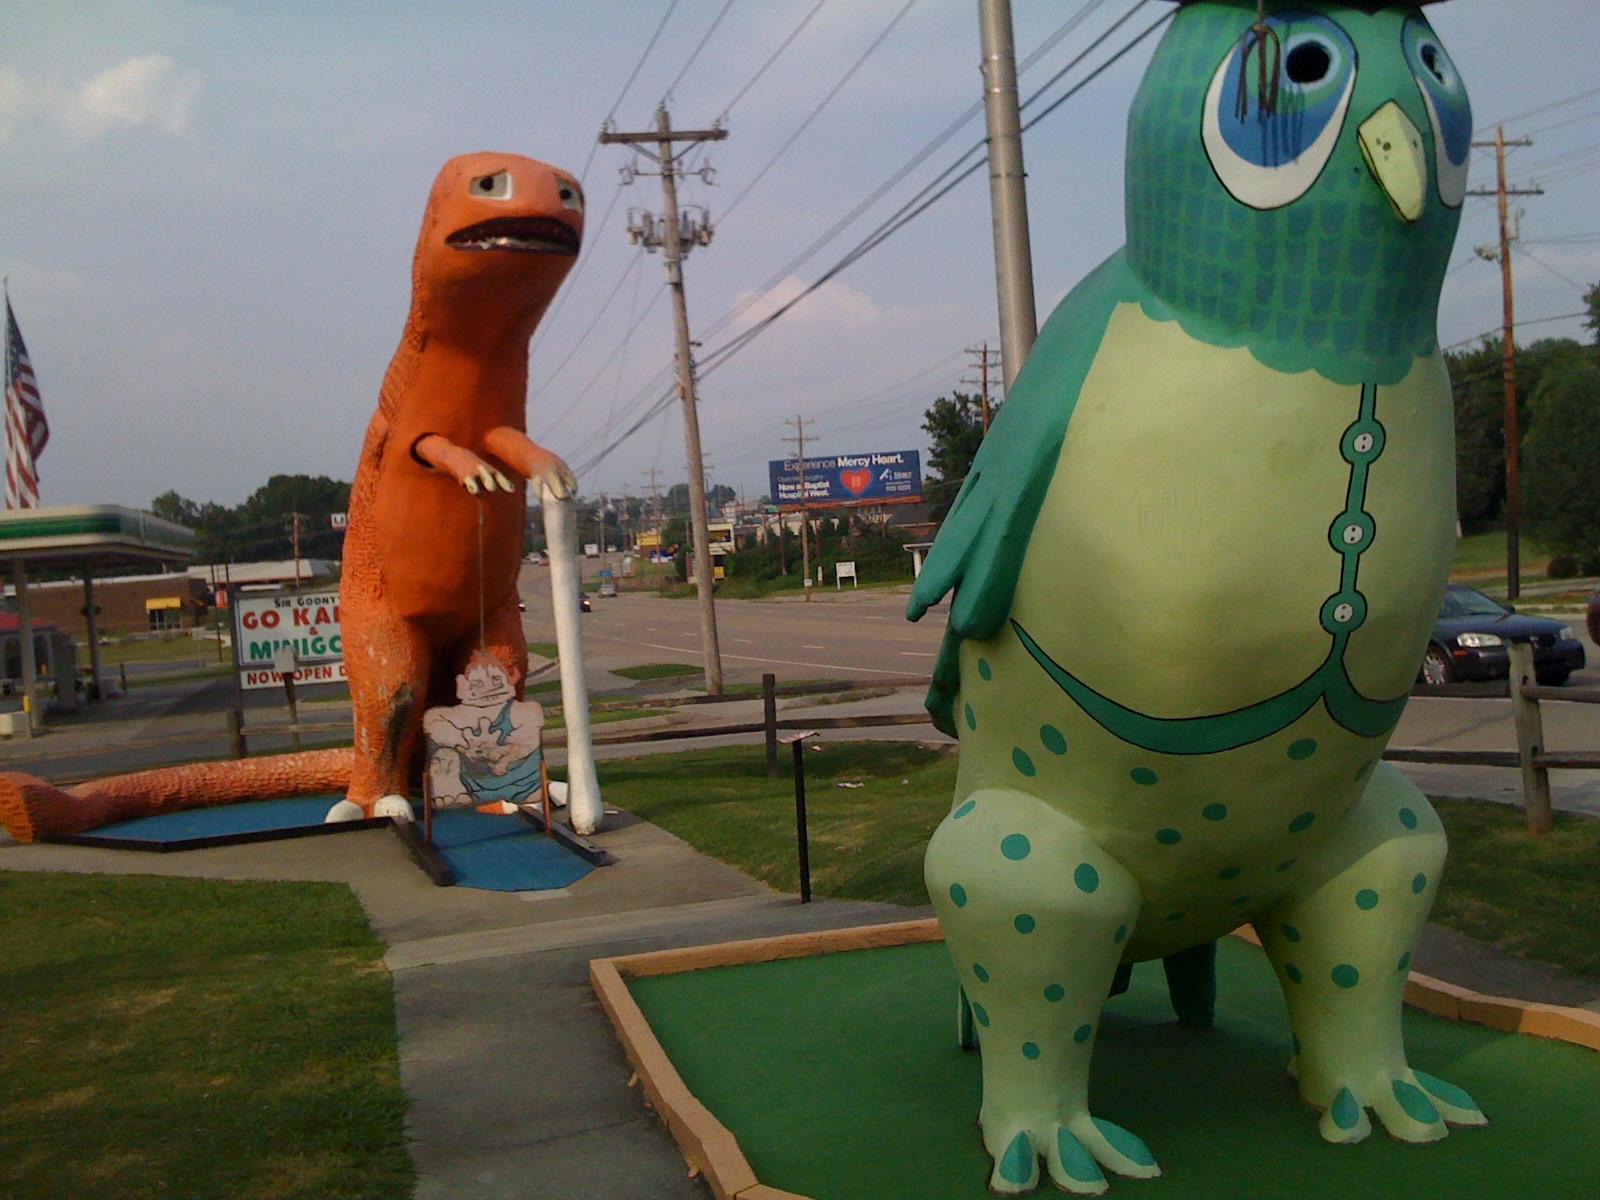 Family Miniature Golf